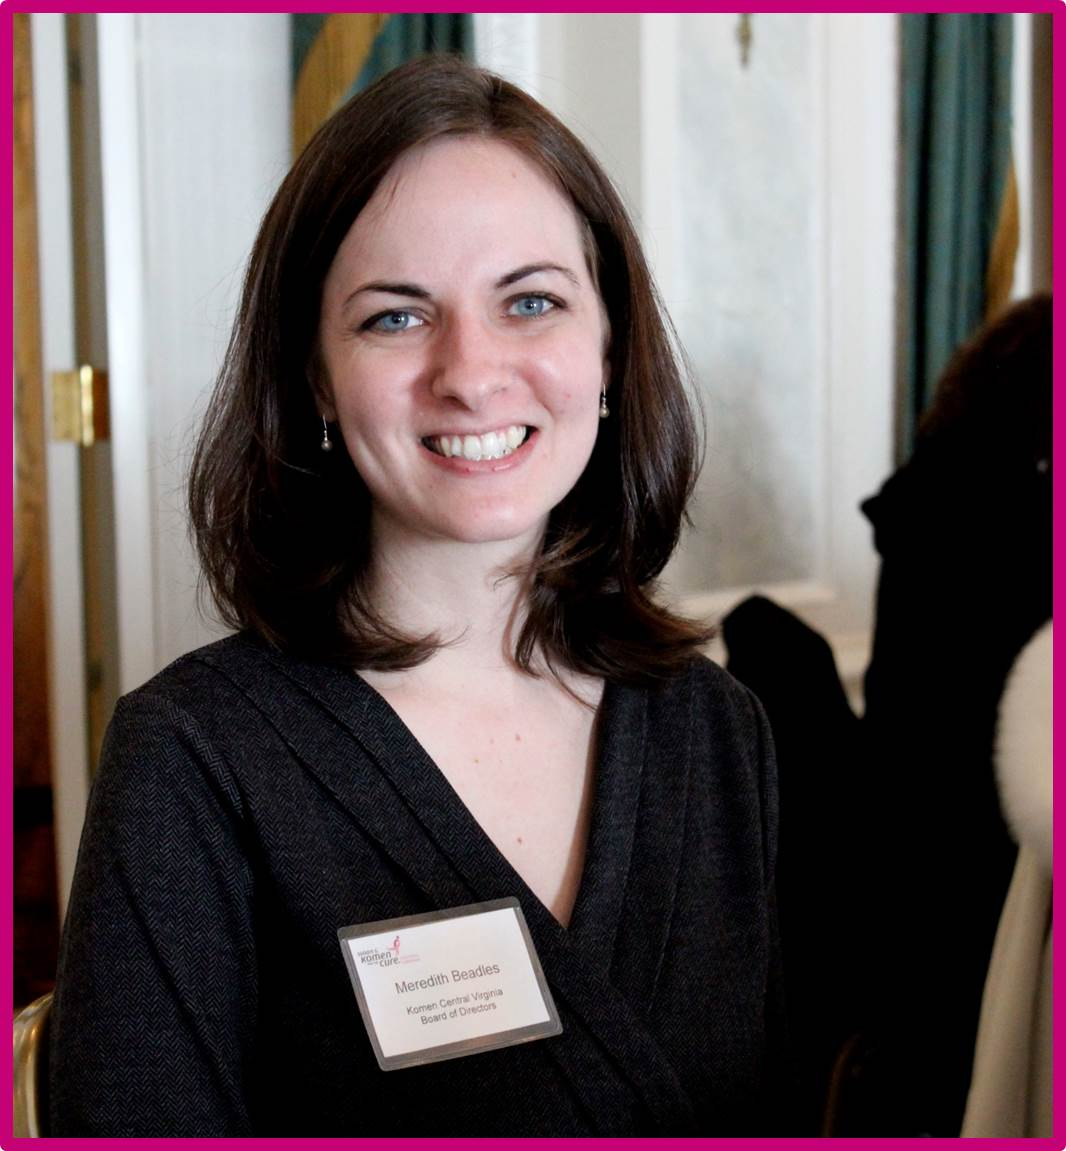 2013 April - Volunteer Spotlight - Meredith Beadles